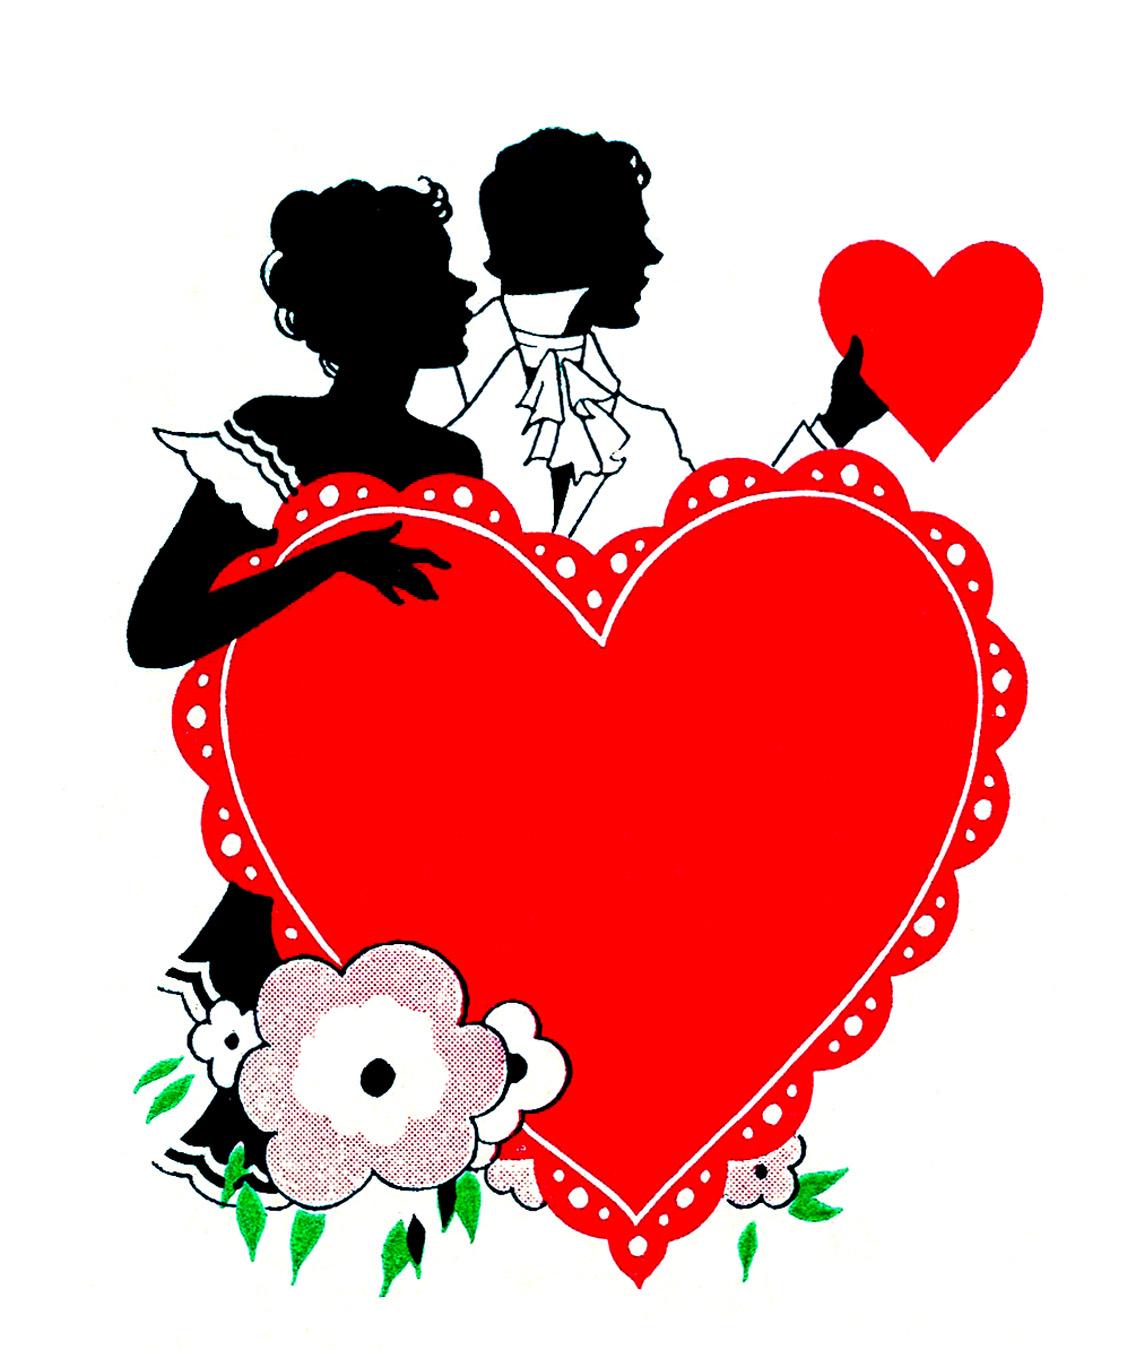 Free Romantic Cliparts, Download Free Clip Art, Free Clip.